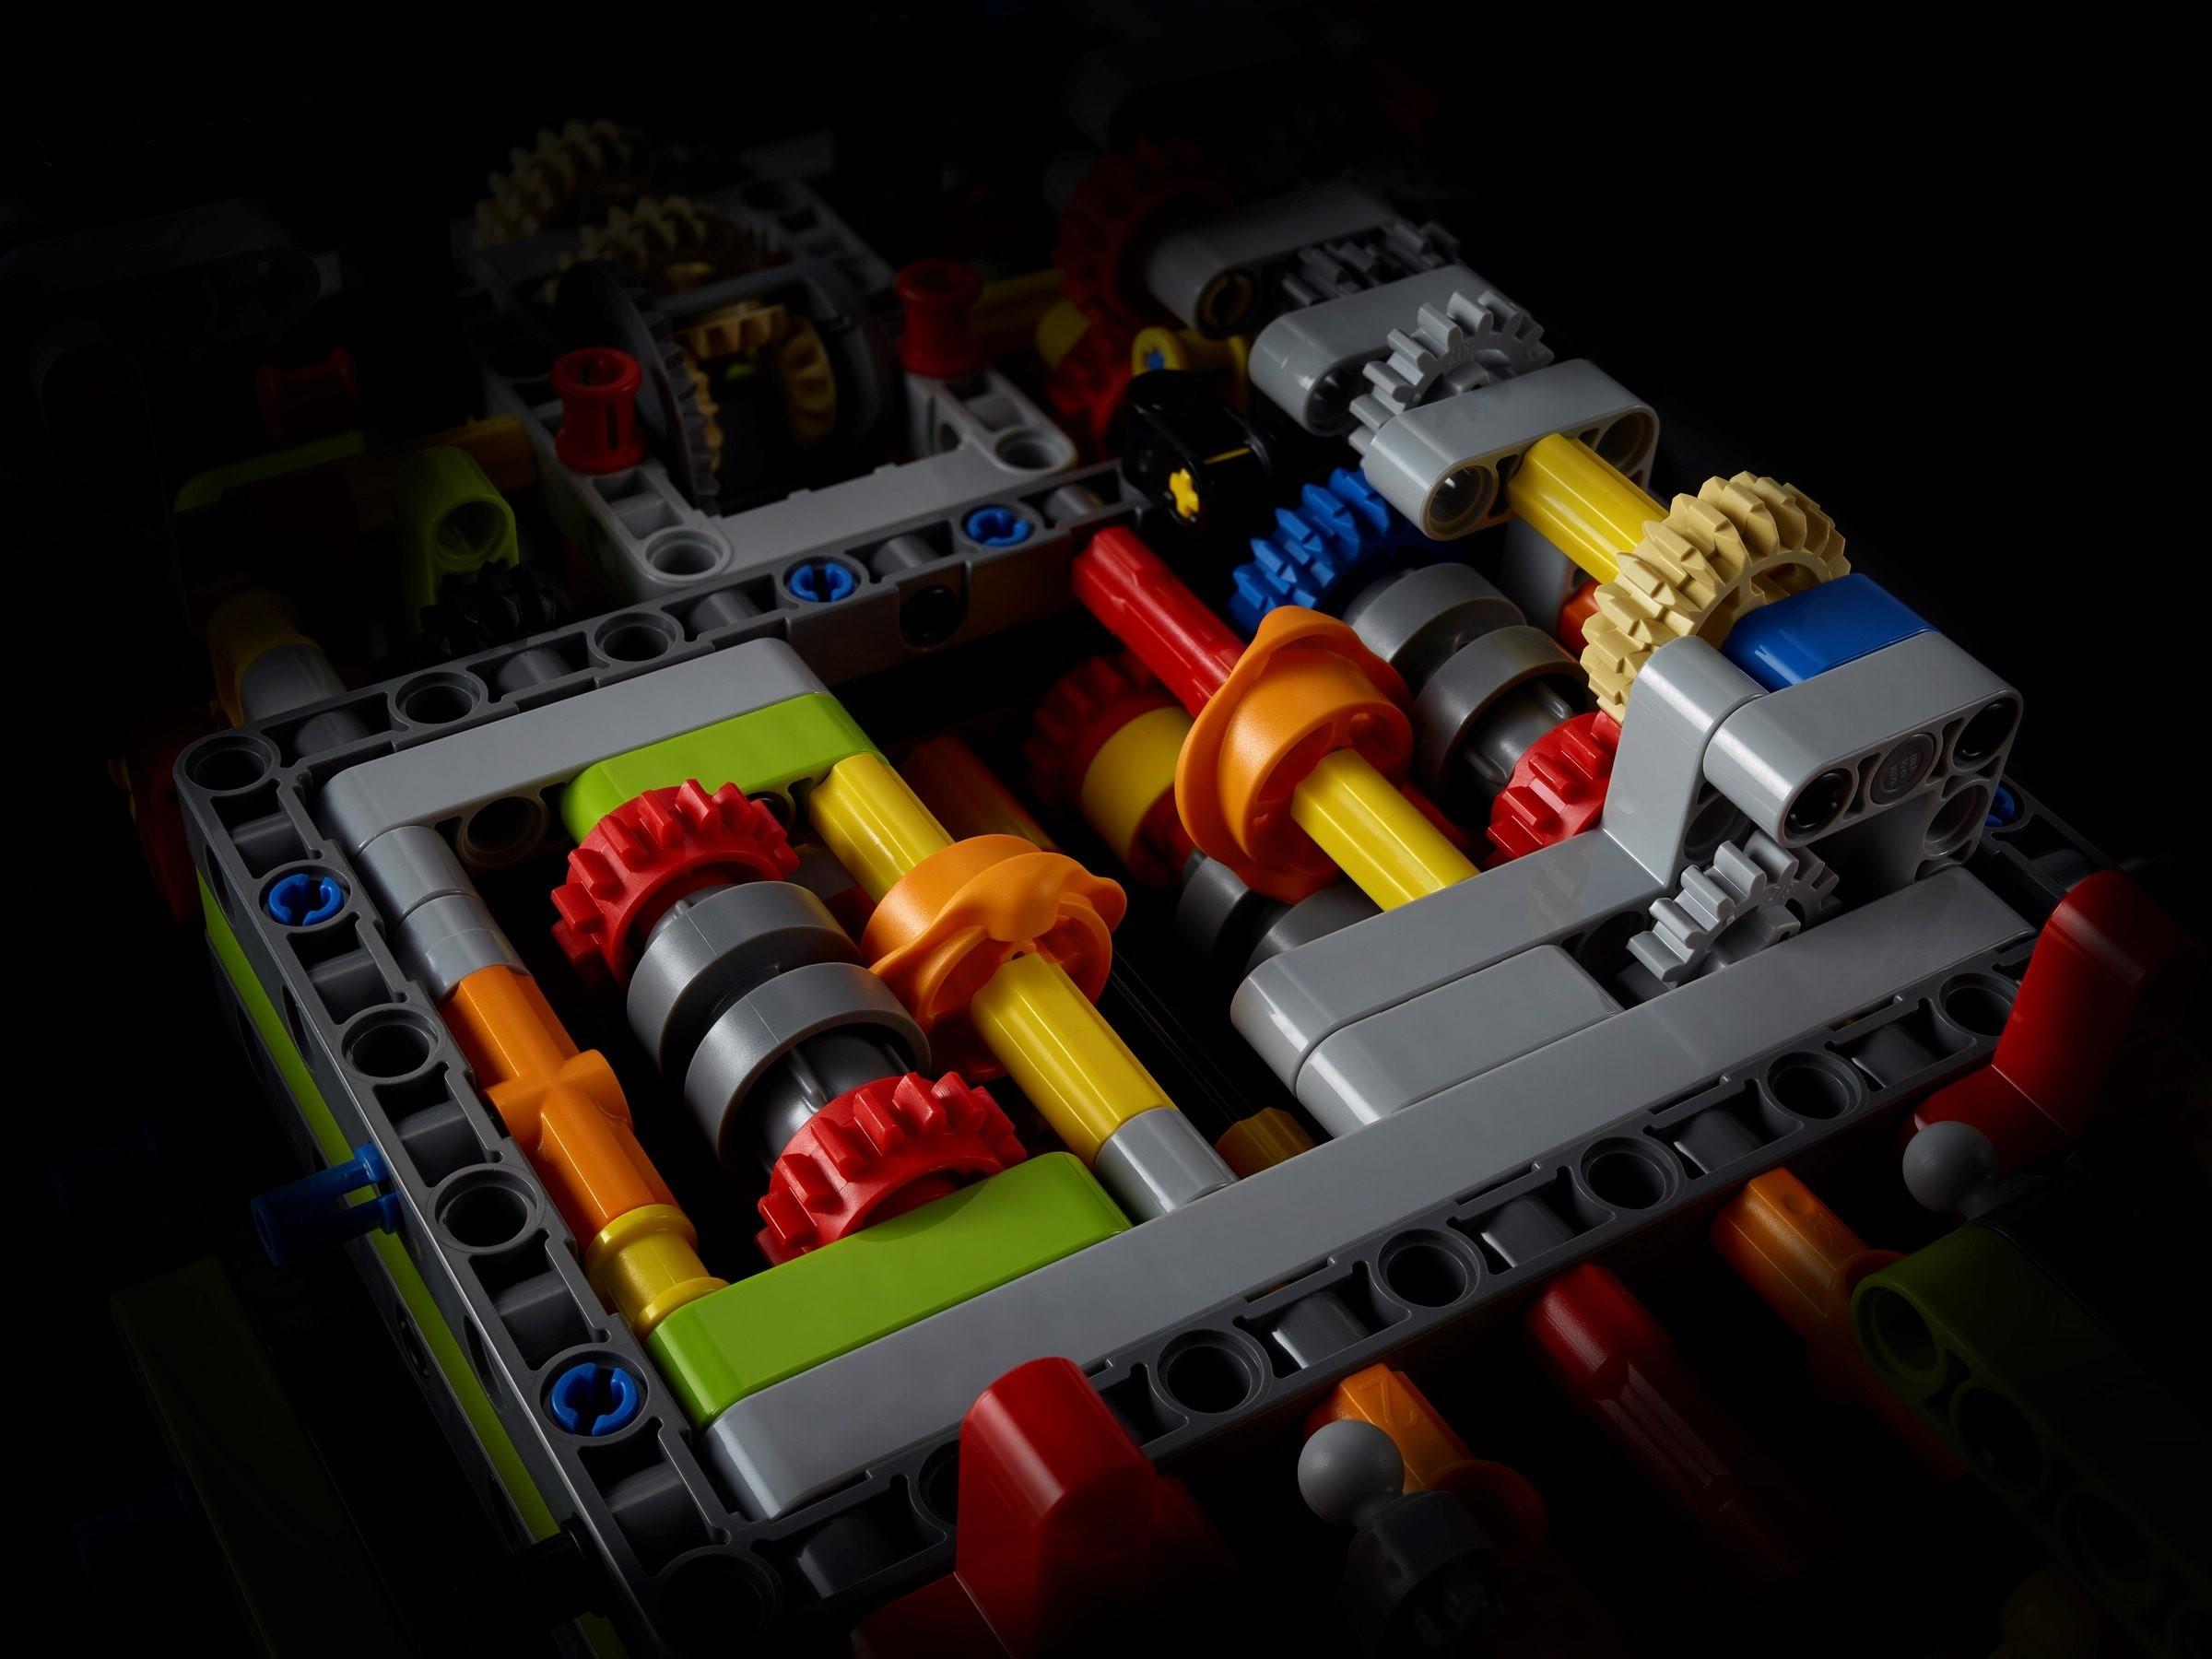 lego-technic-42115-lamborghini-sian-fkp-37-2020-bricks zusammengebaut.com